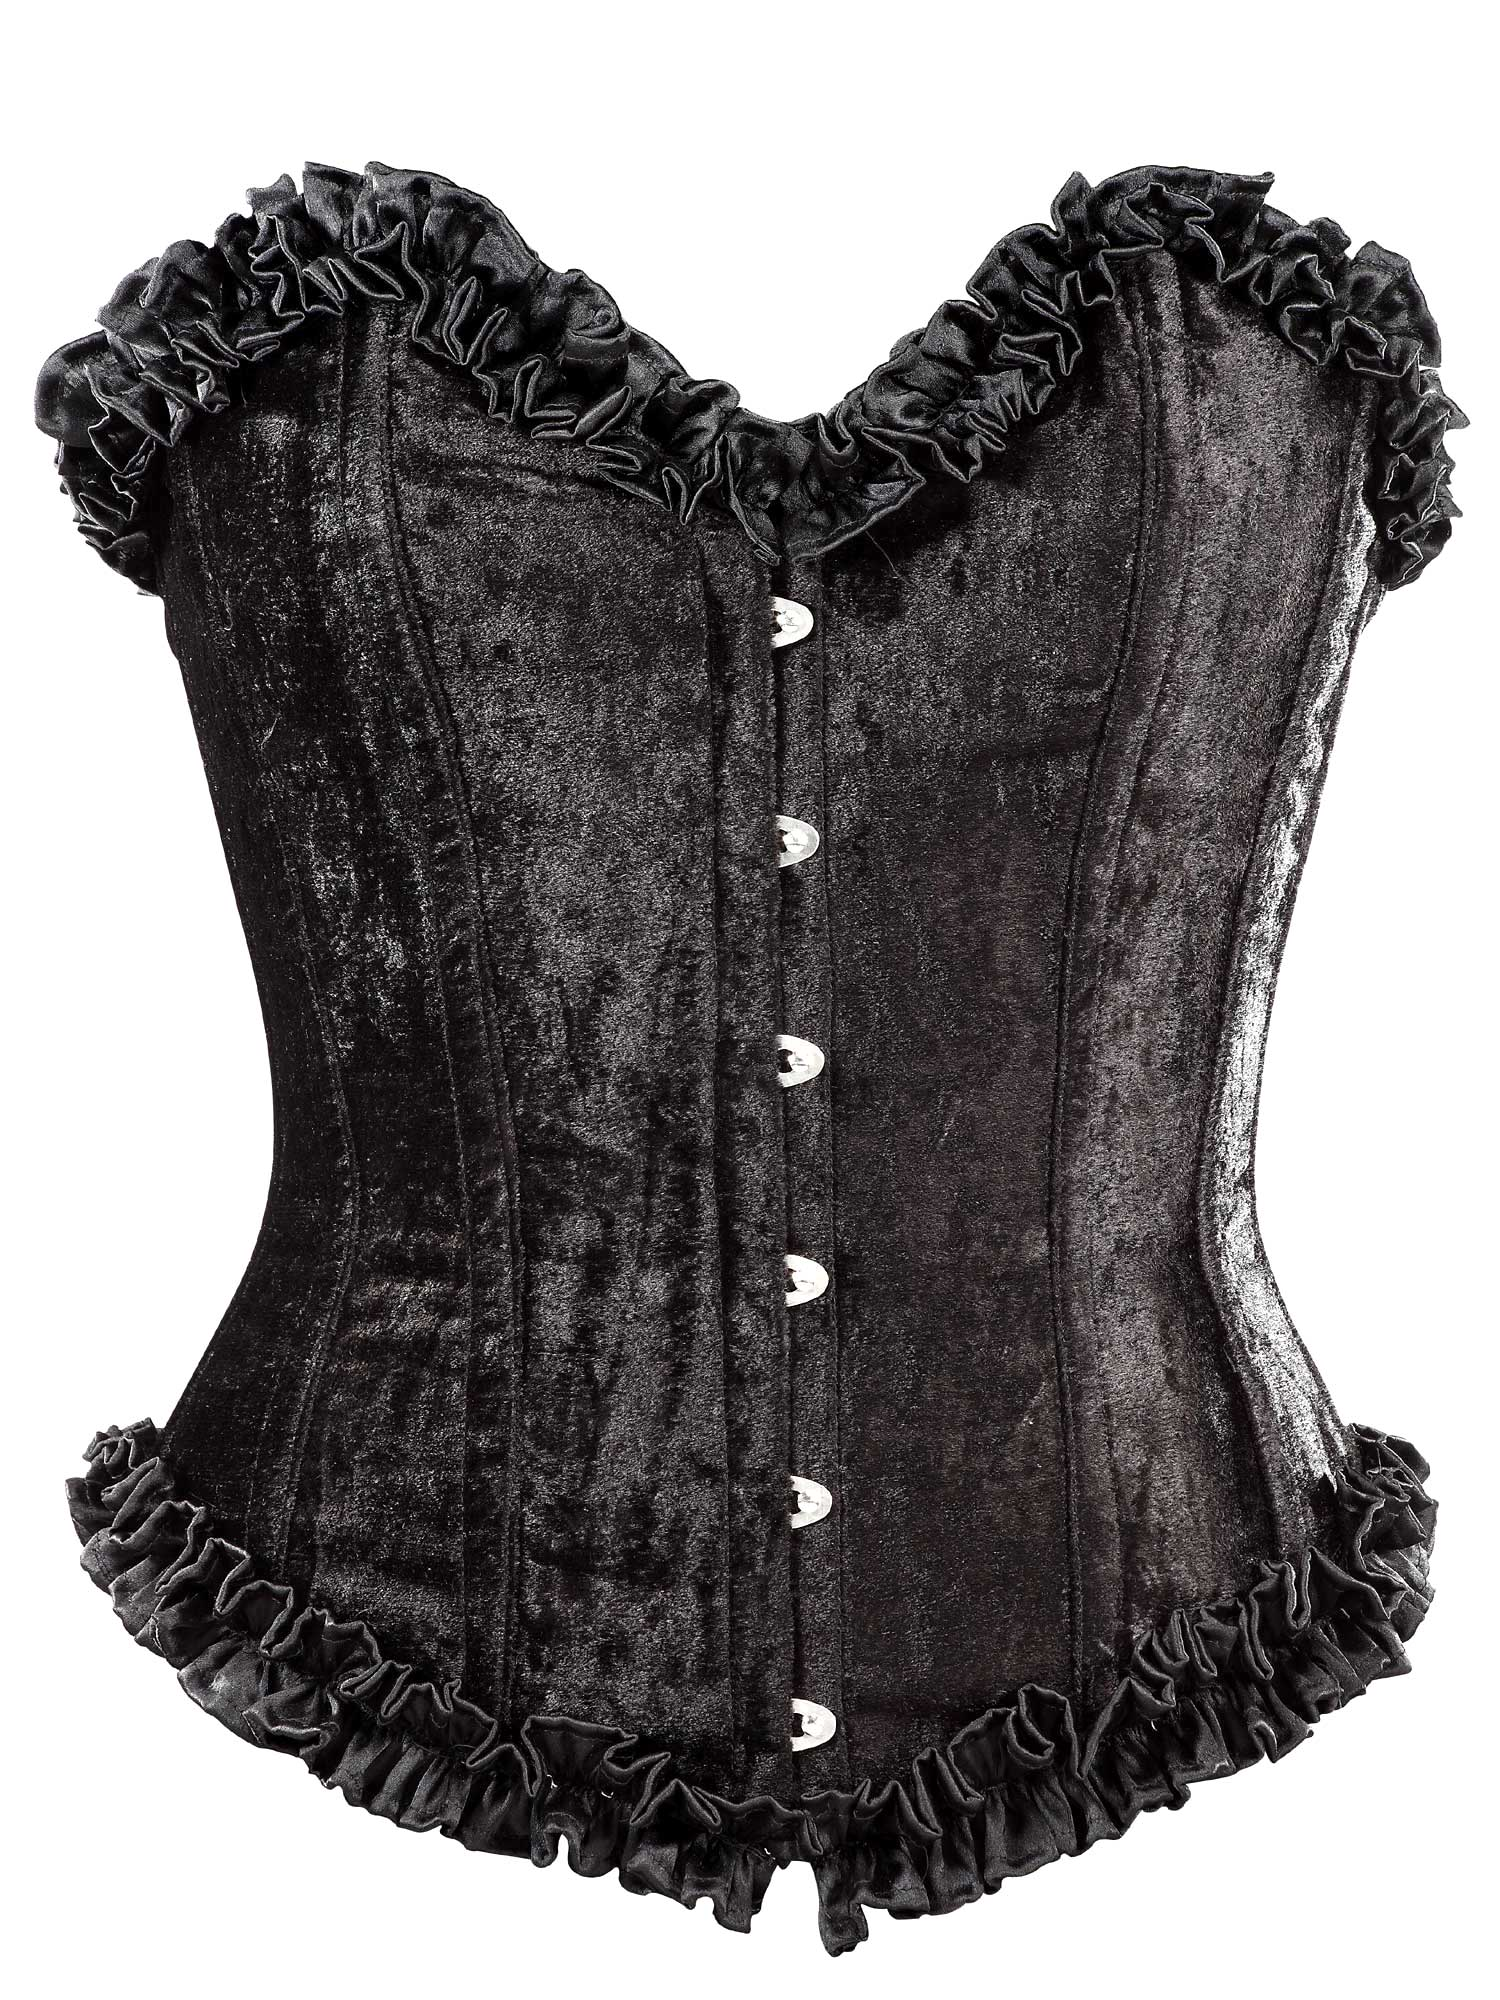 black_velvet_fabric_steel_boning_overbust_corset_waist_cincher_bustier_bustiers_and_corsets_5.jpg